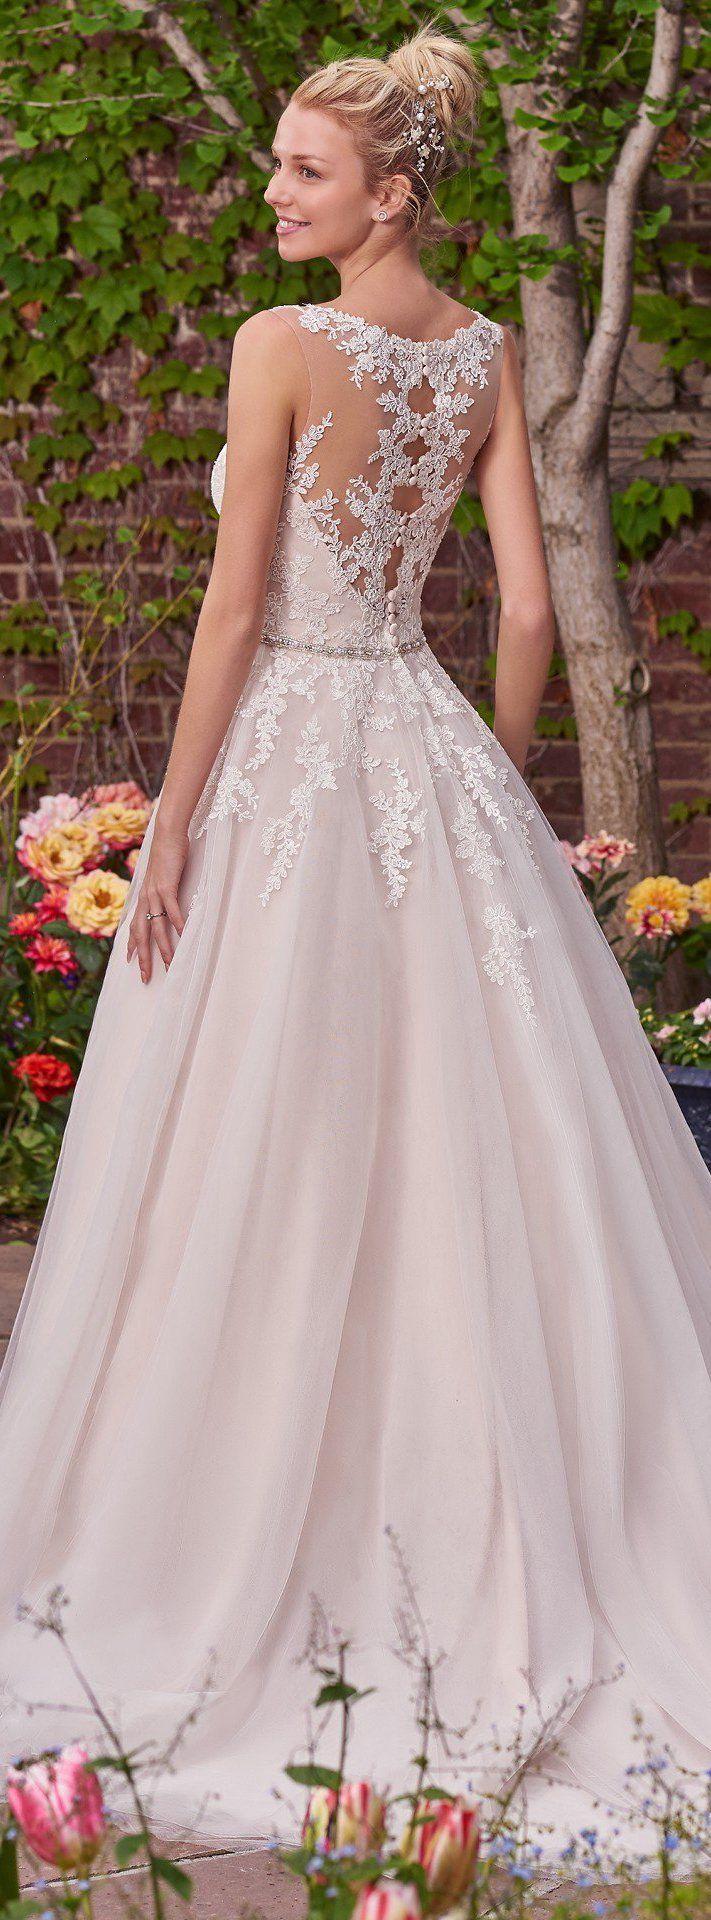 Wedding Dress by Rebecca Ingram - Olivia | Less than $1,000 | #rebeccaingram #rebeccabride